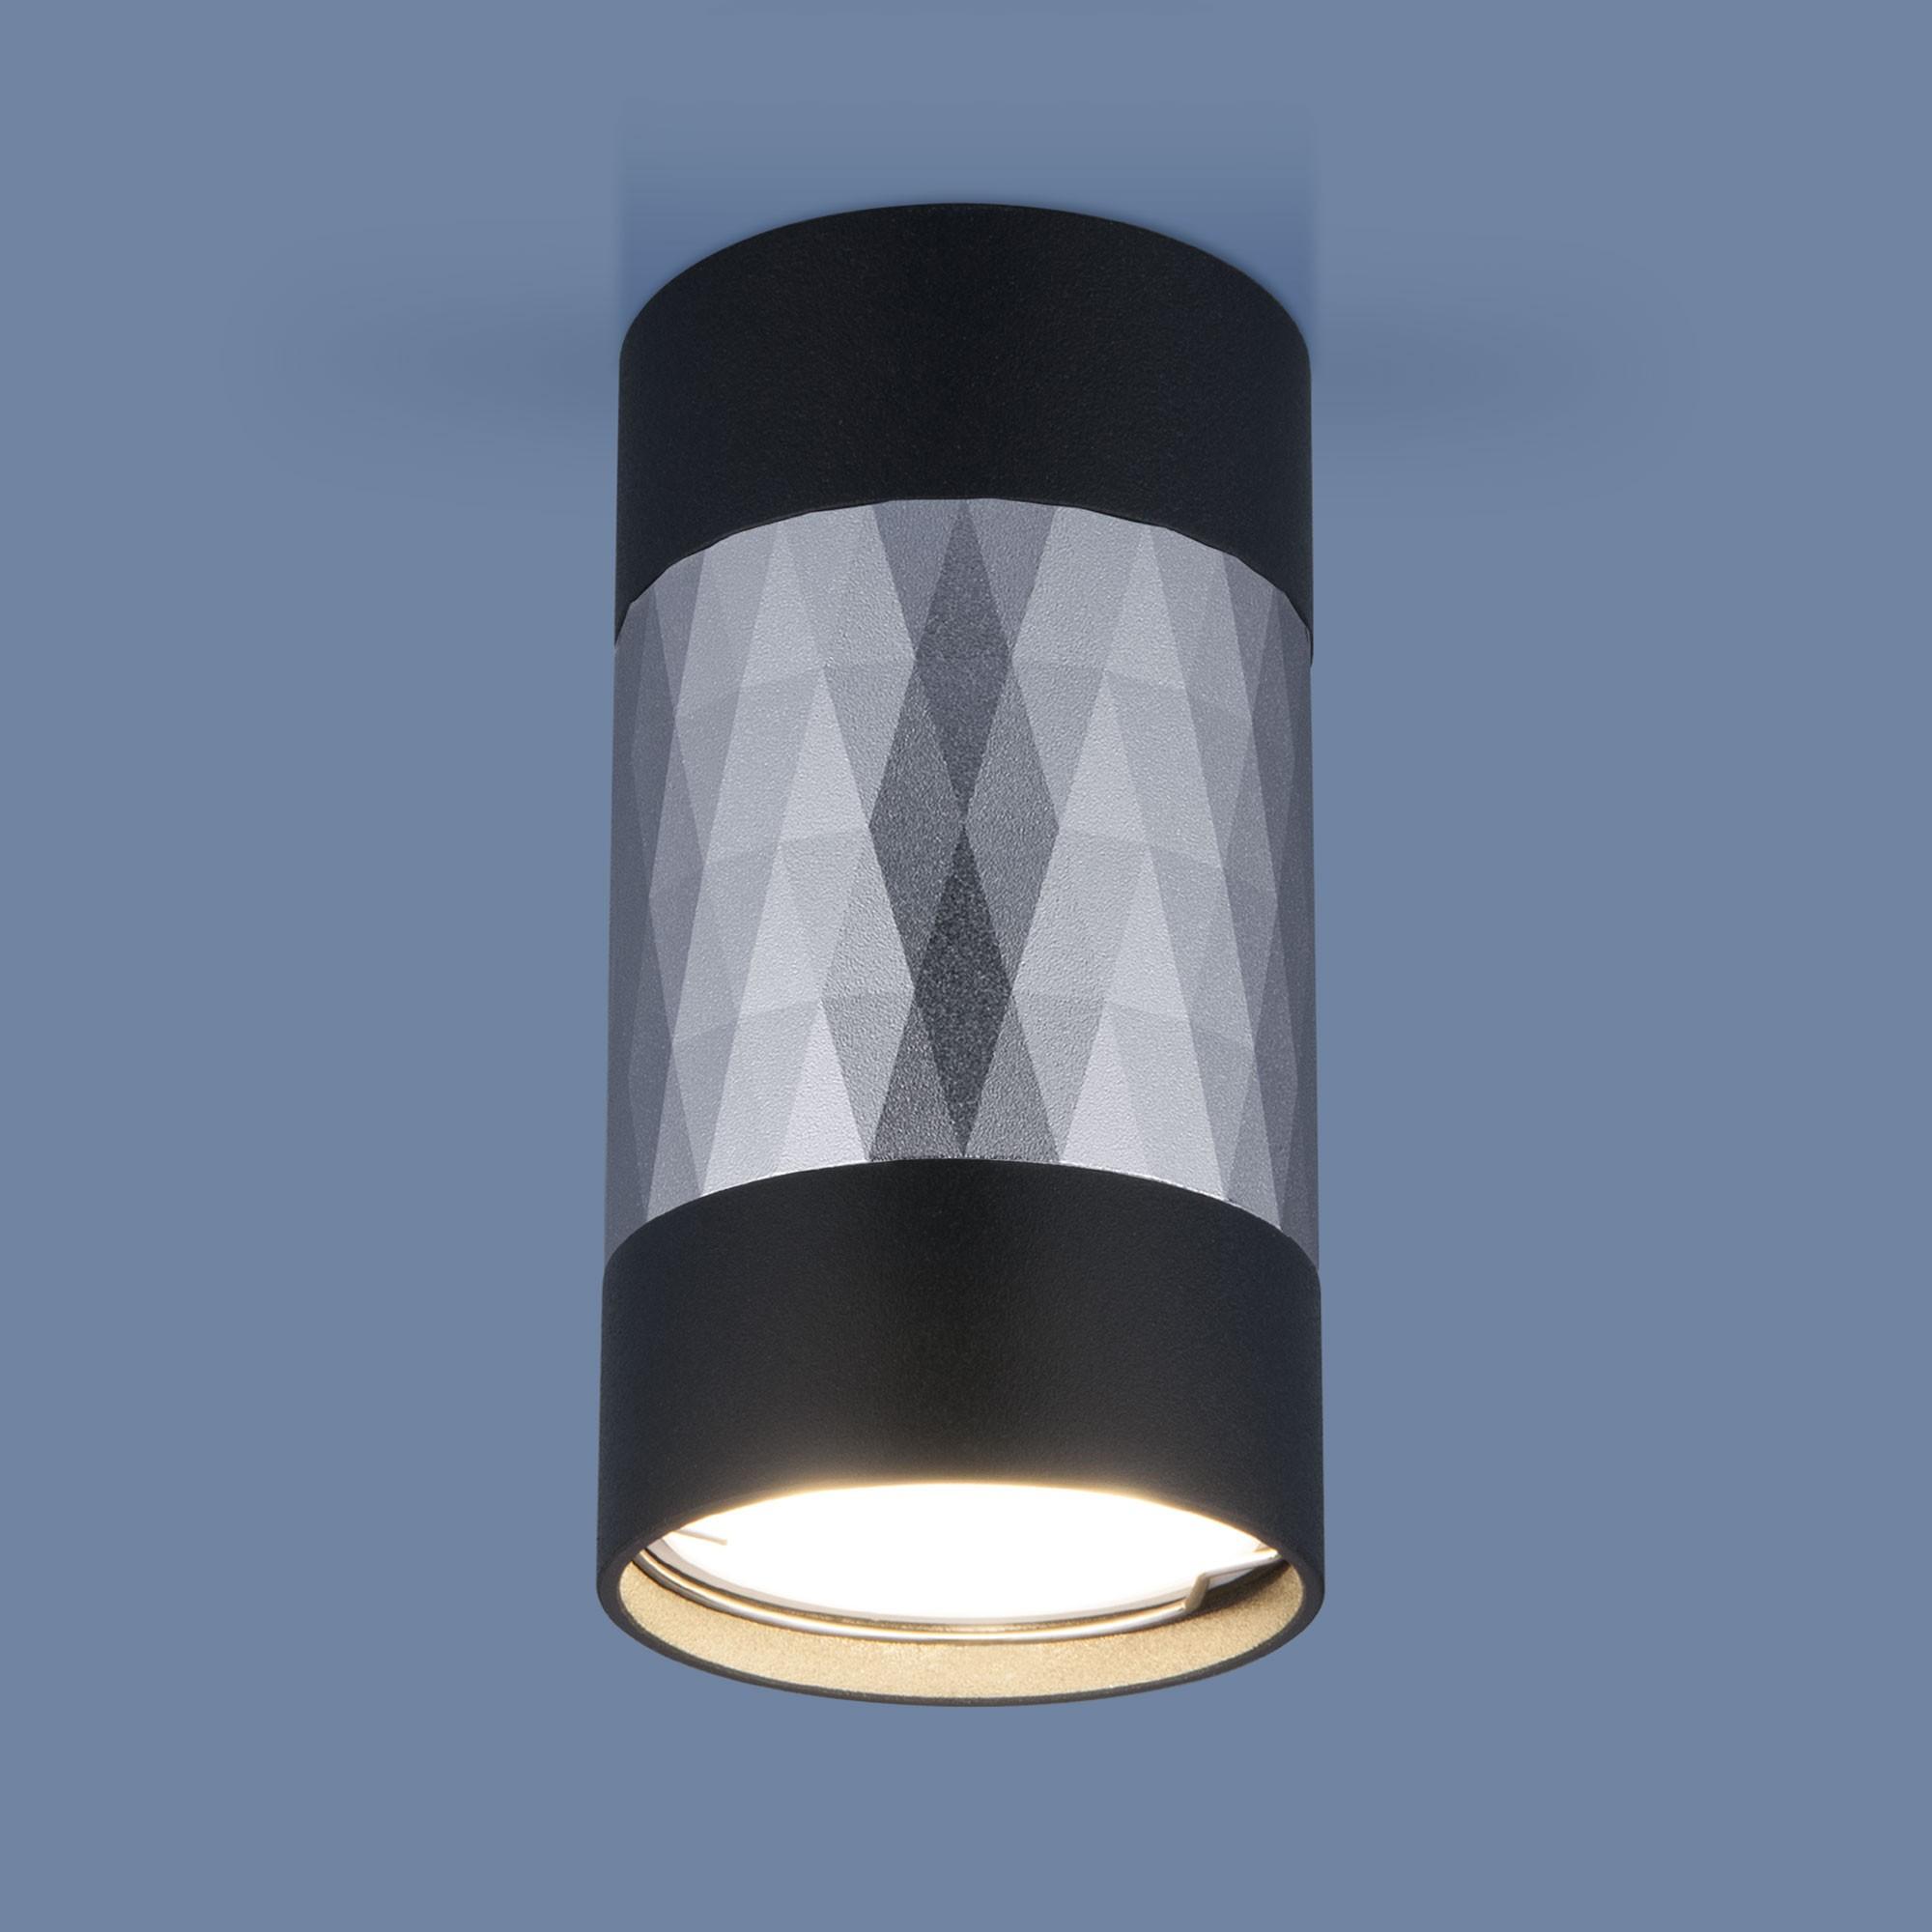 DLN110 GU10 черный/серебро